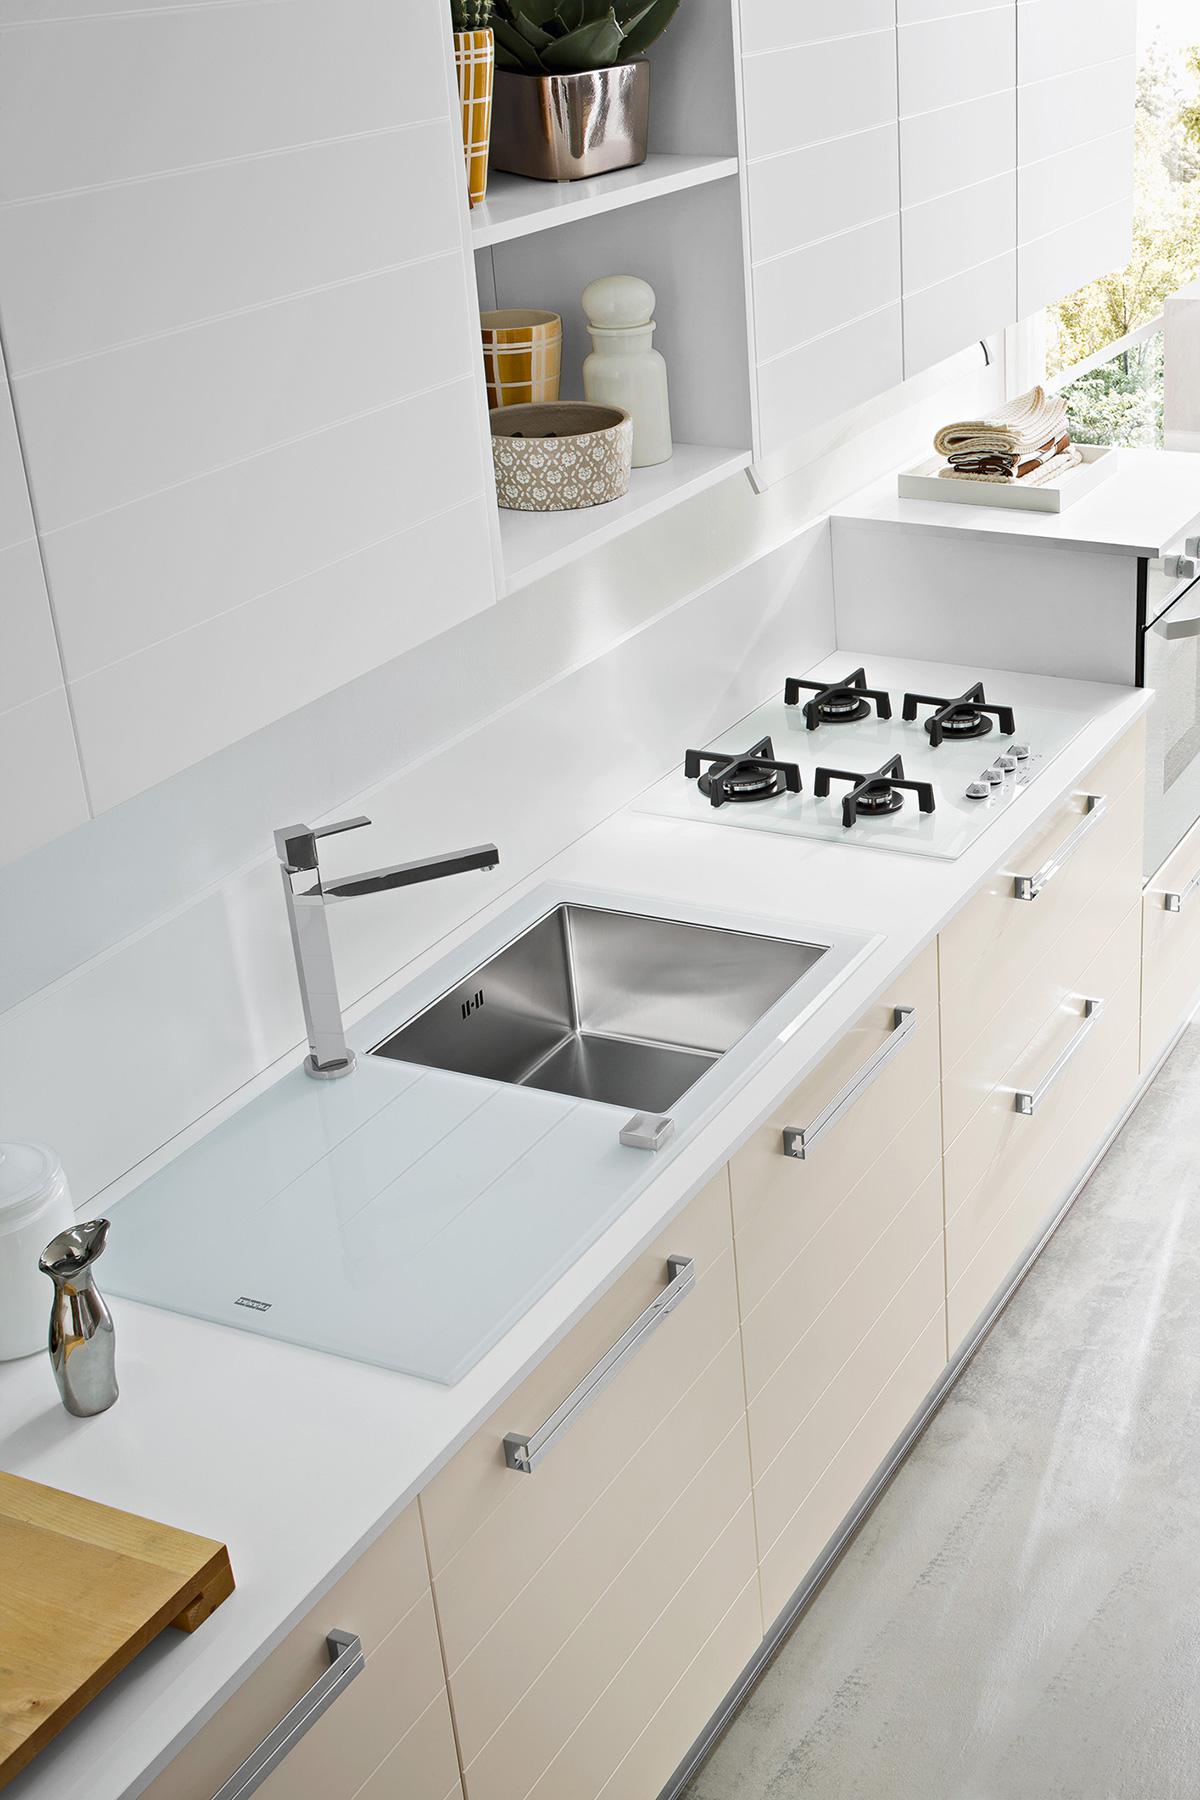 Ar-Tre   Mito - Cucine moderne in legno con particolari vintage